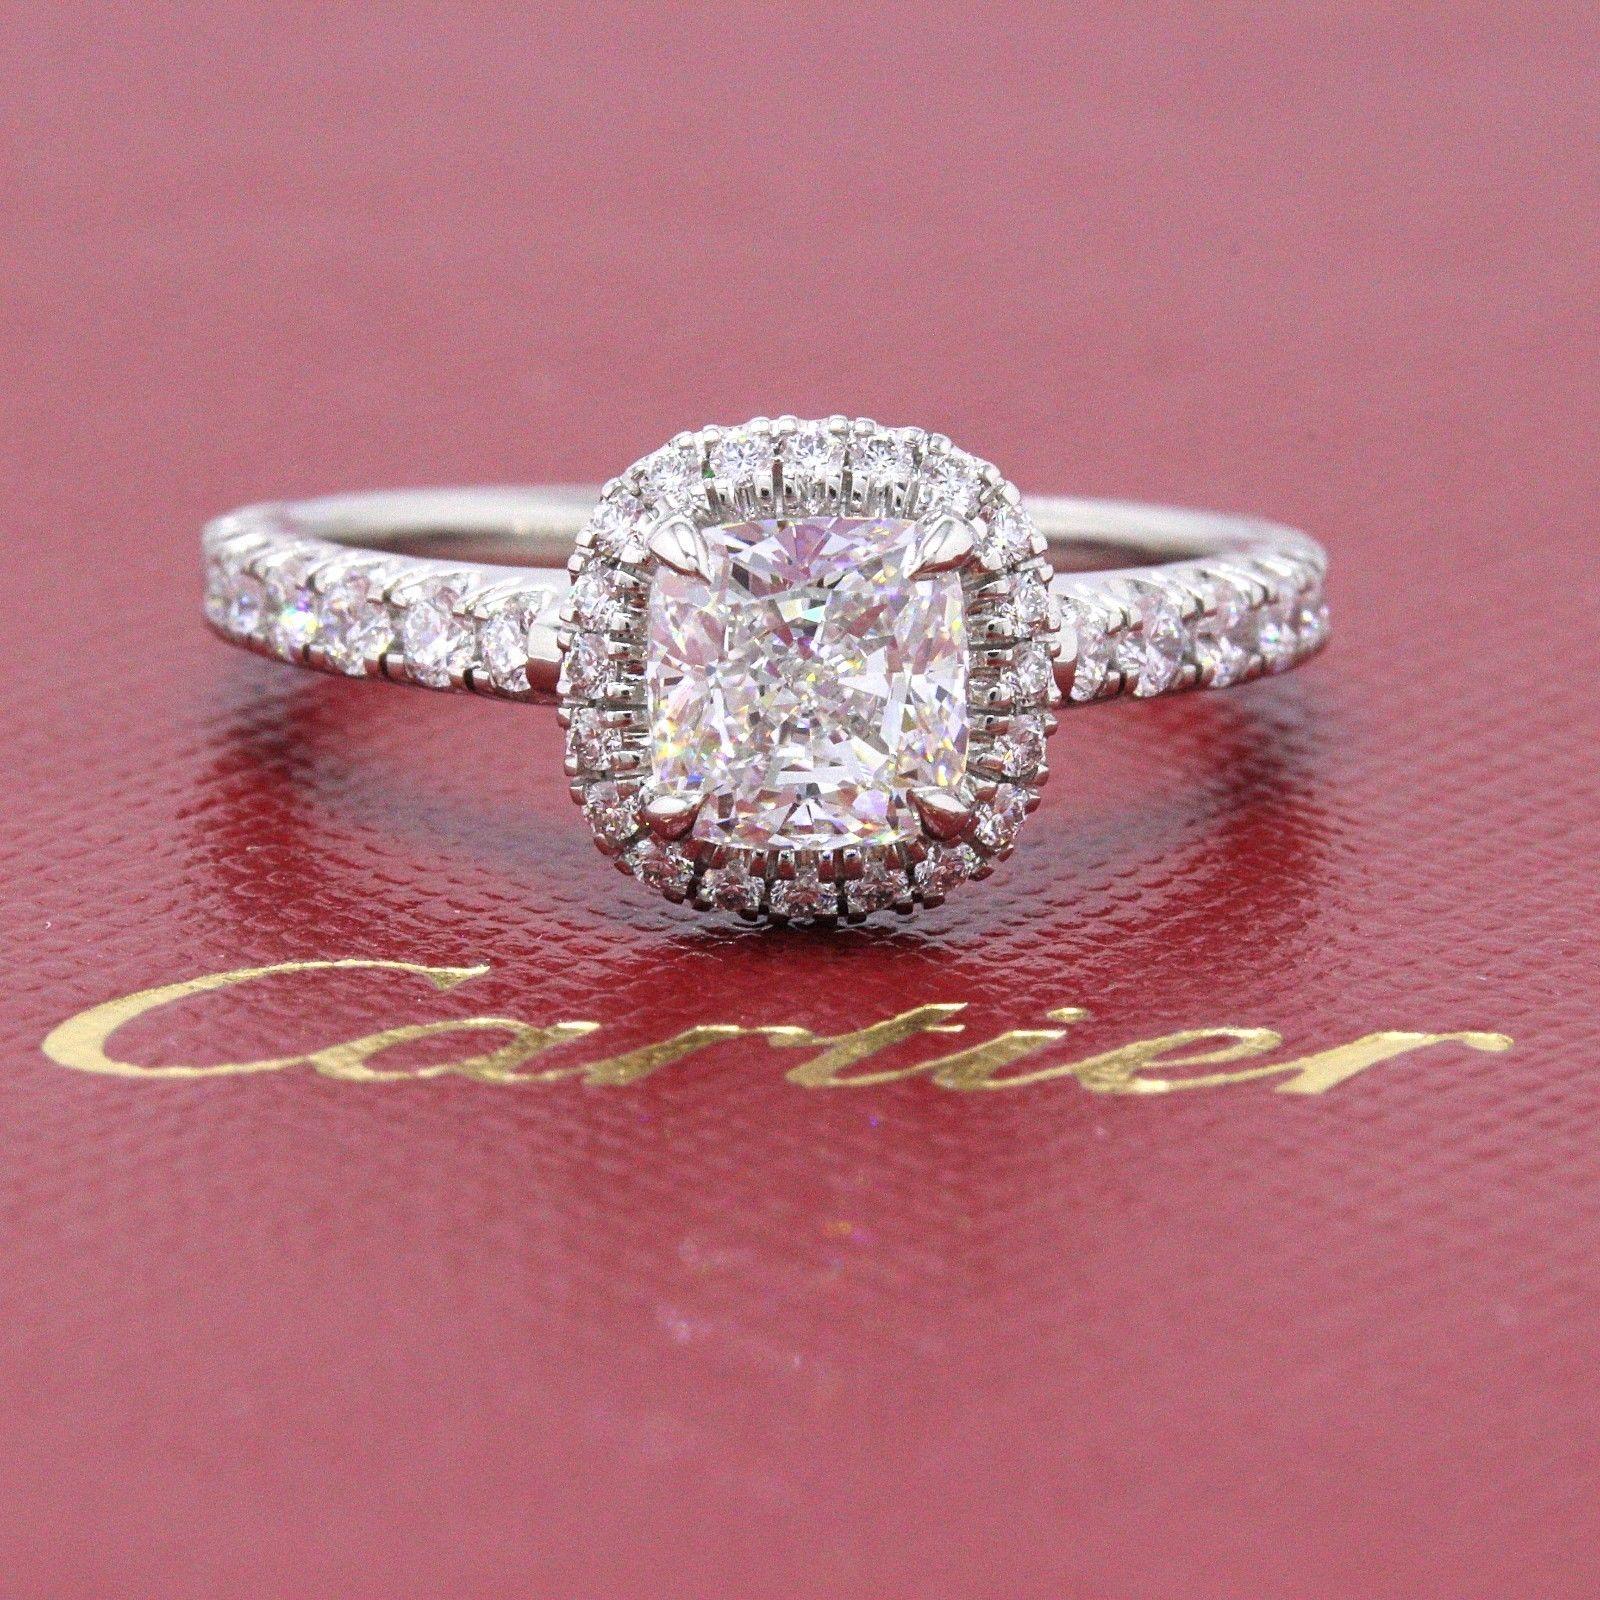 Quality Diamonds of San Diego Rings - San Diego, CA 92101 - 1stdibs